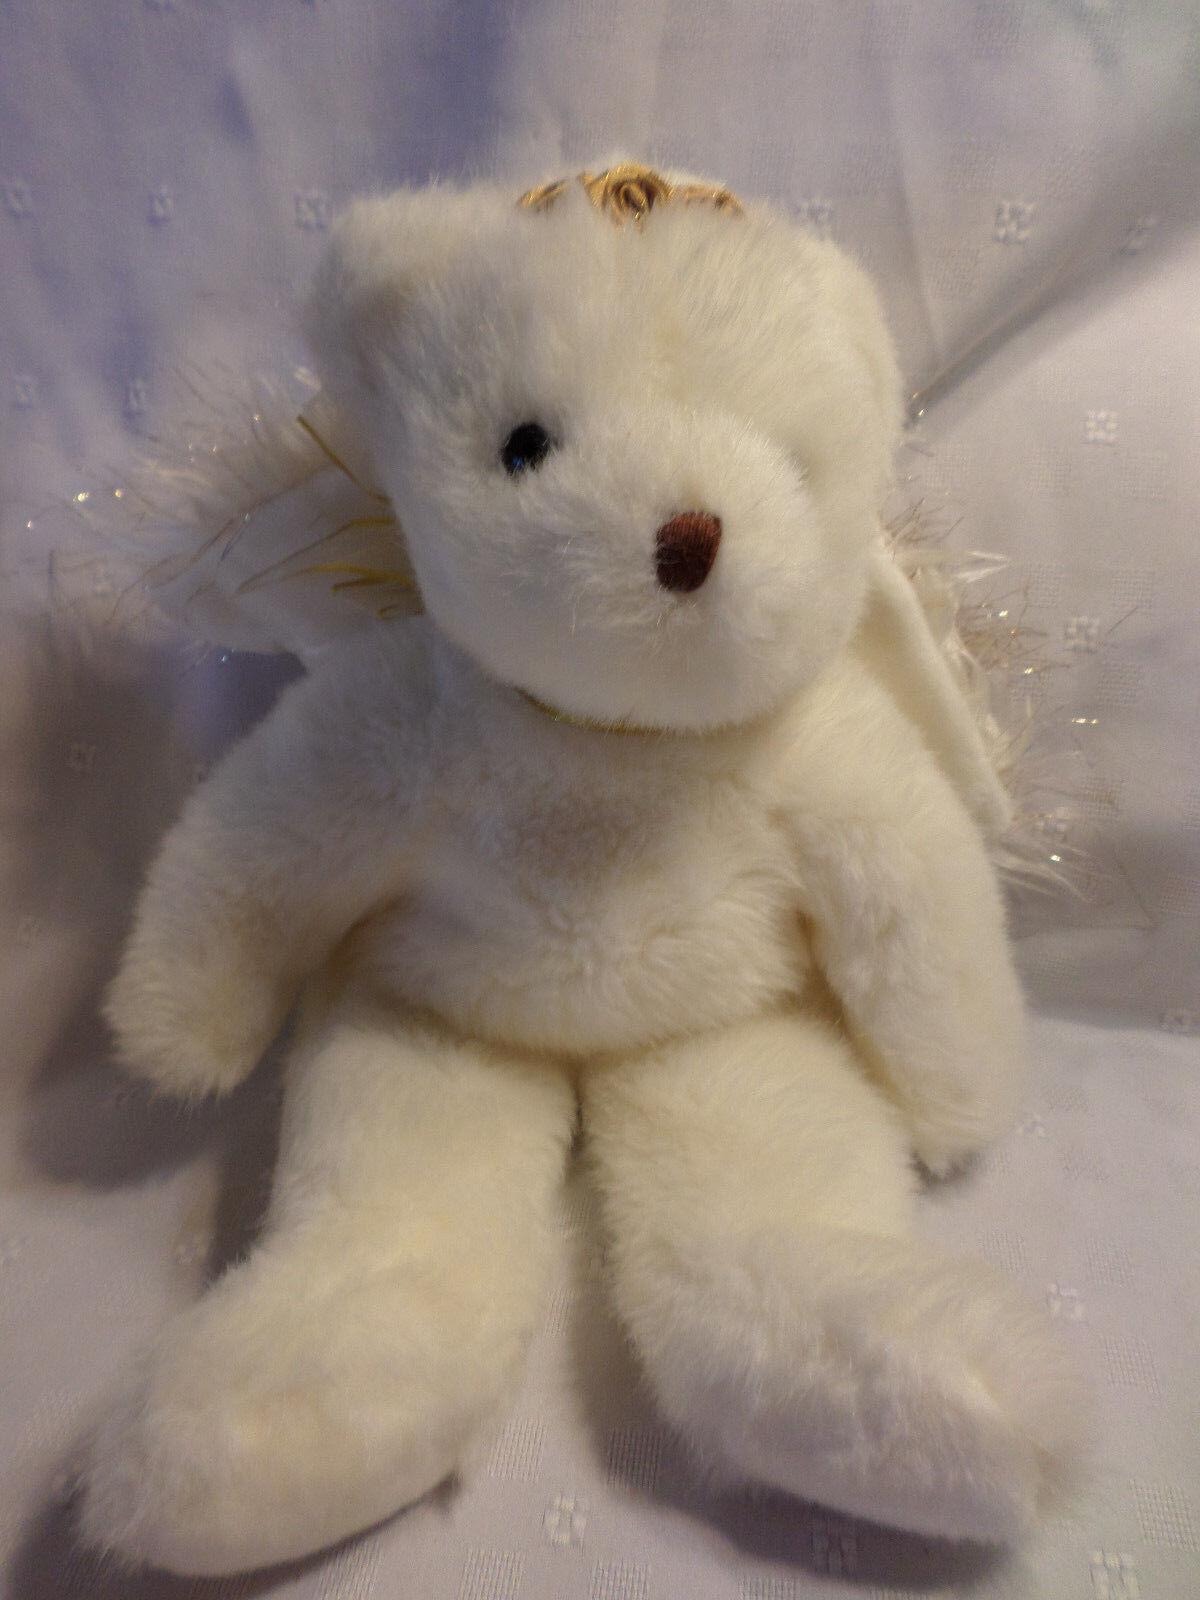 2001 Vntg Angel Beanie Buddies Ty gold White 15  Plush Soft Toy Stuffed Animal